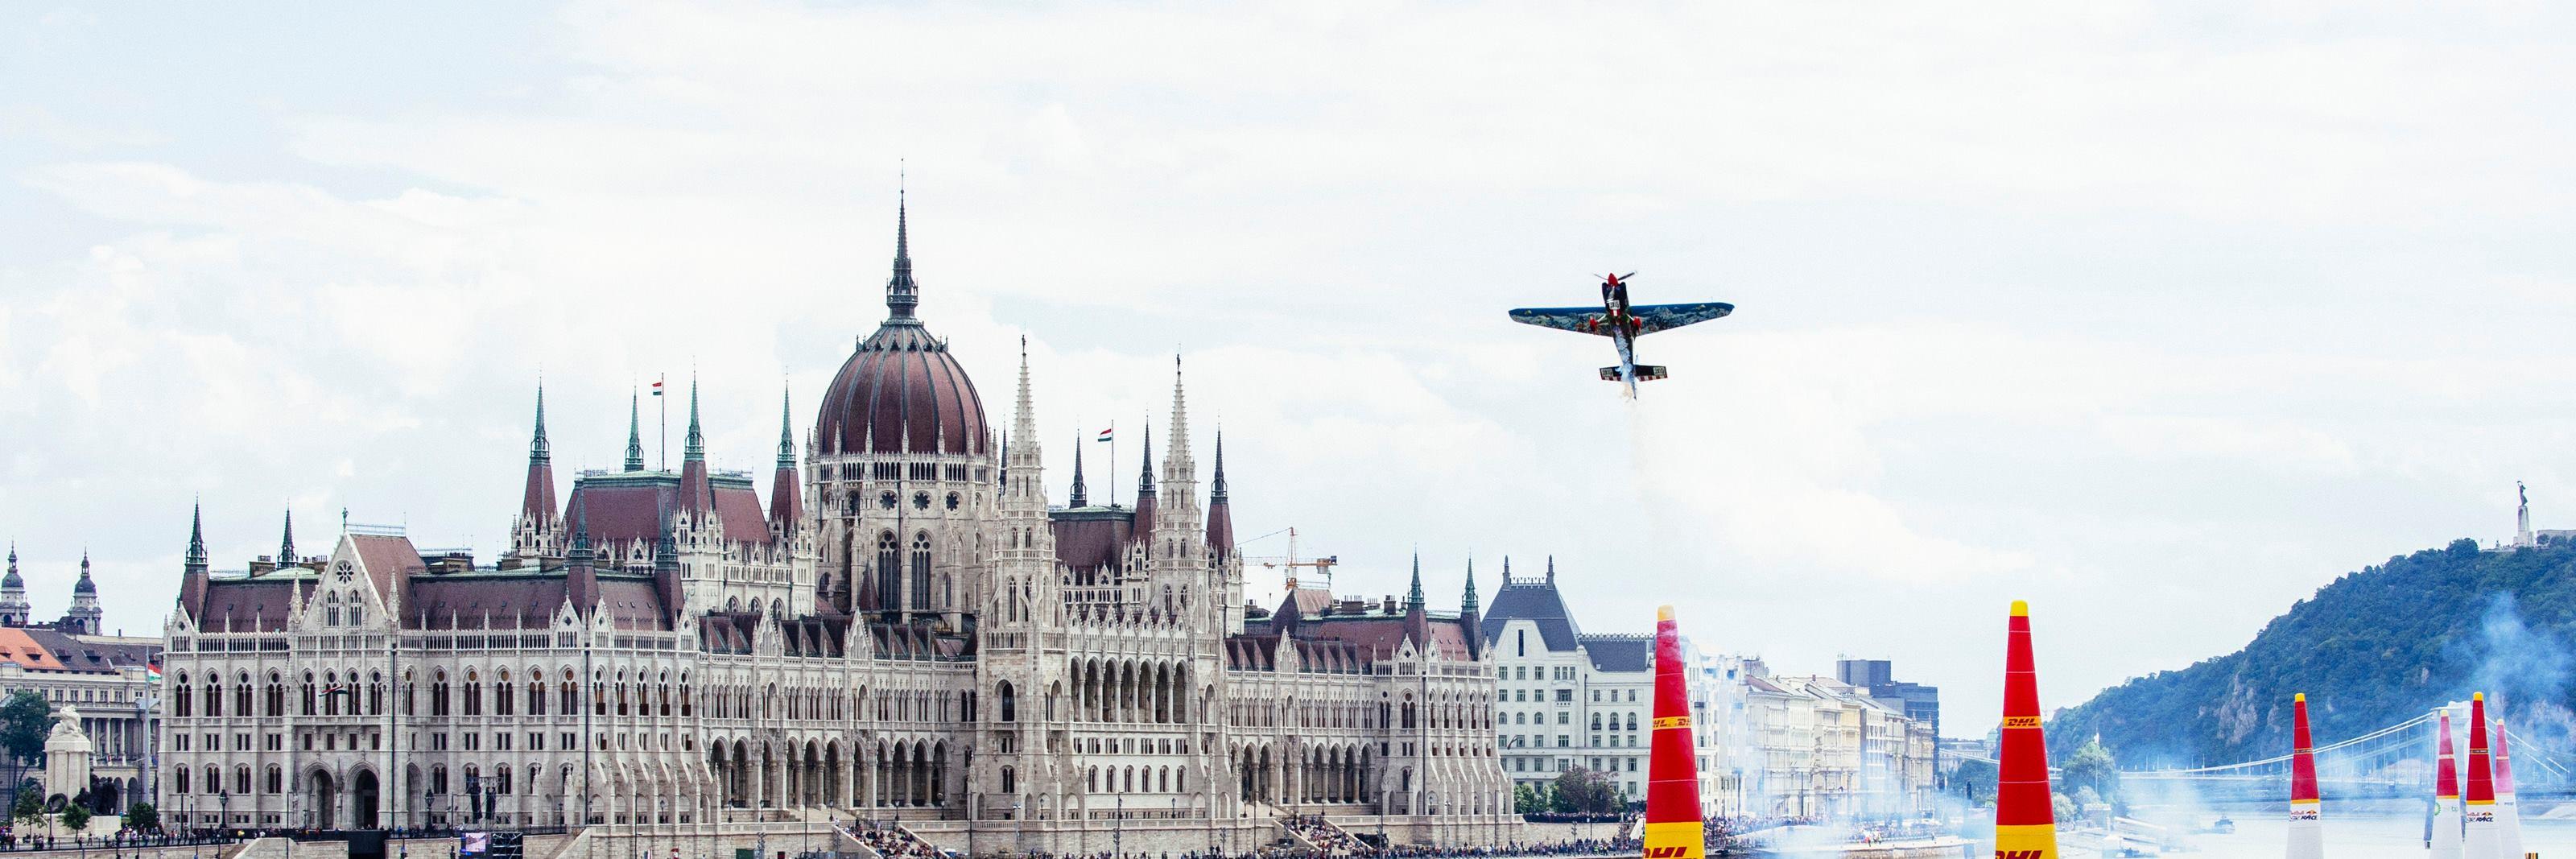 Red Bull Air Race to be held in Zamárdi, Lake Balaton